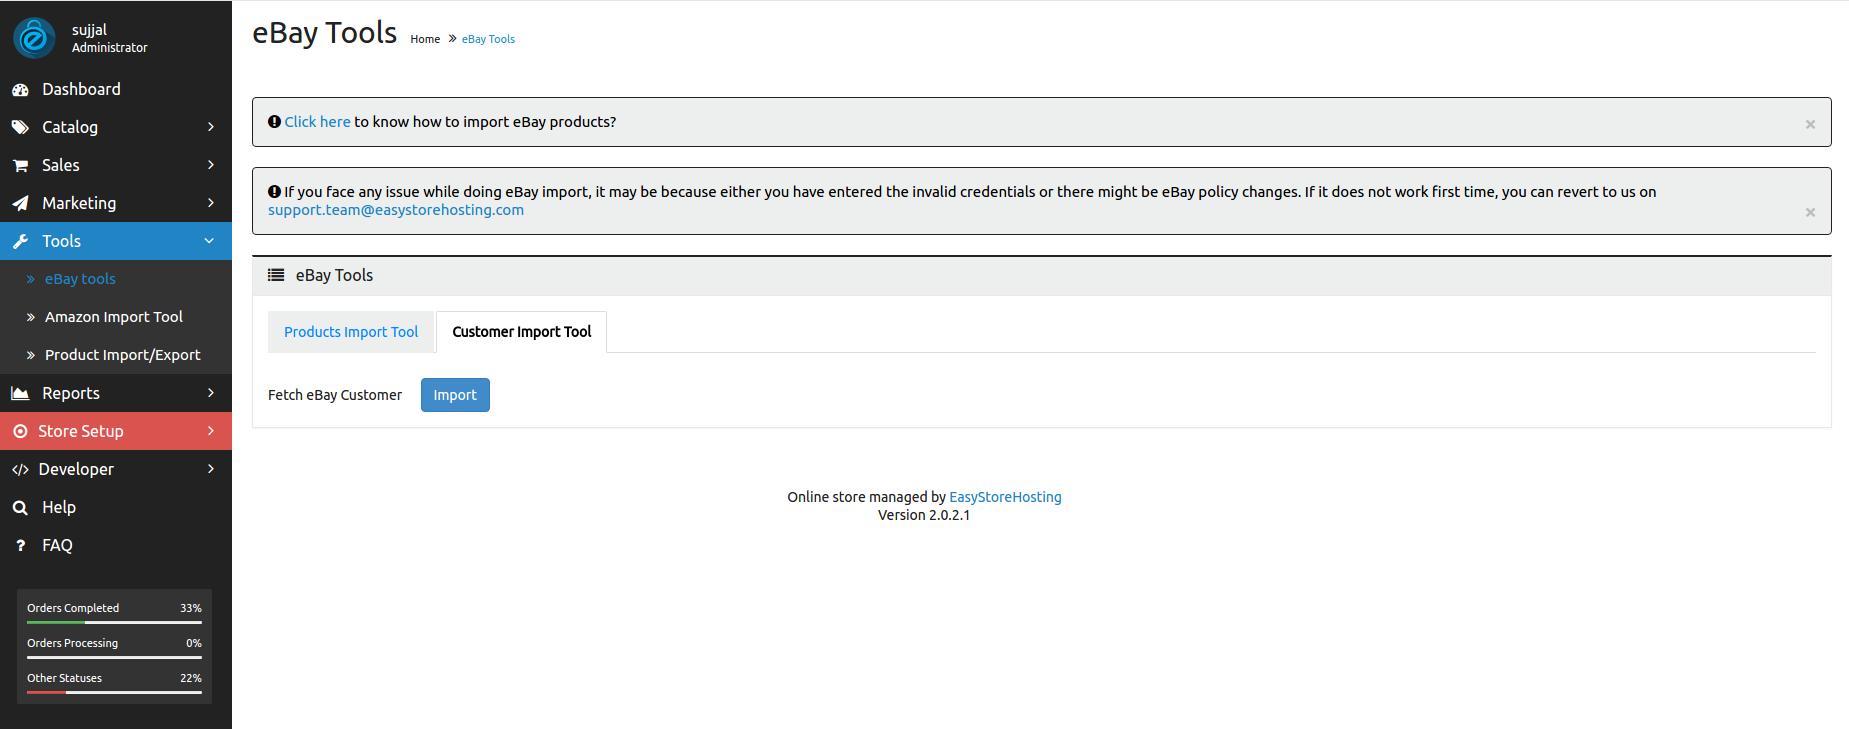 eBay customer import